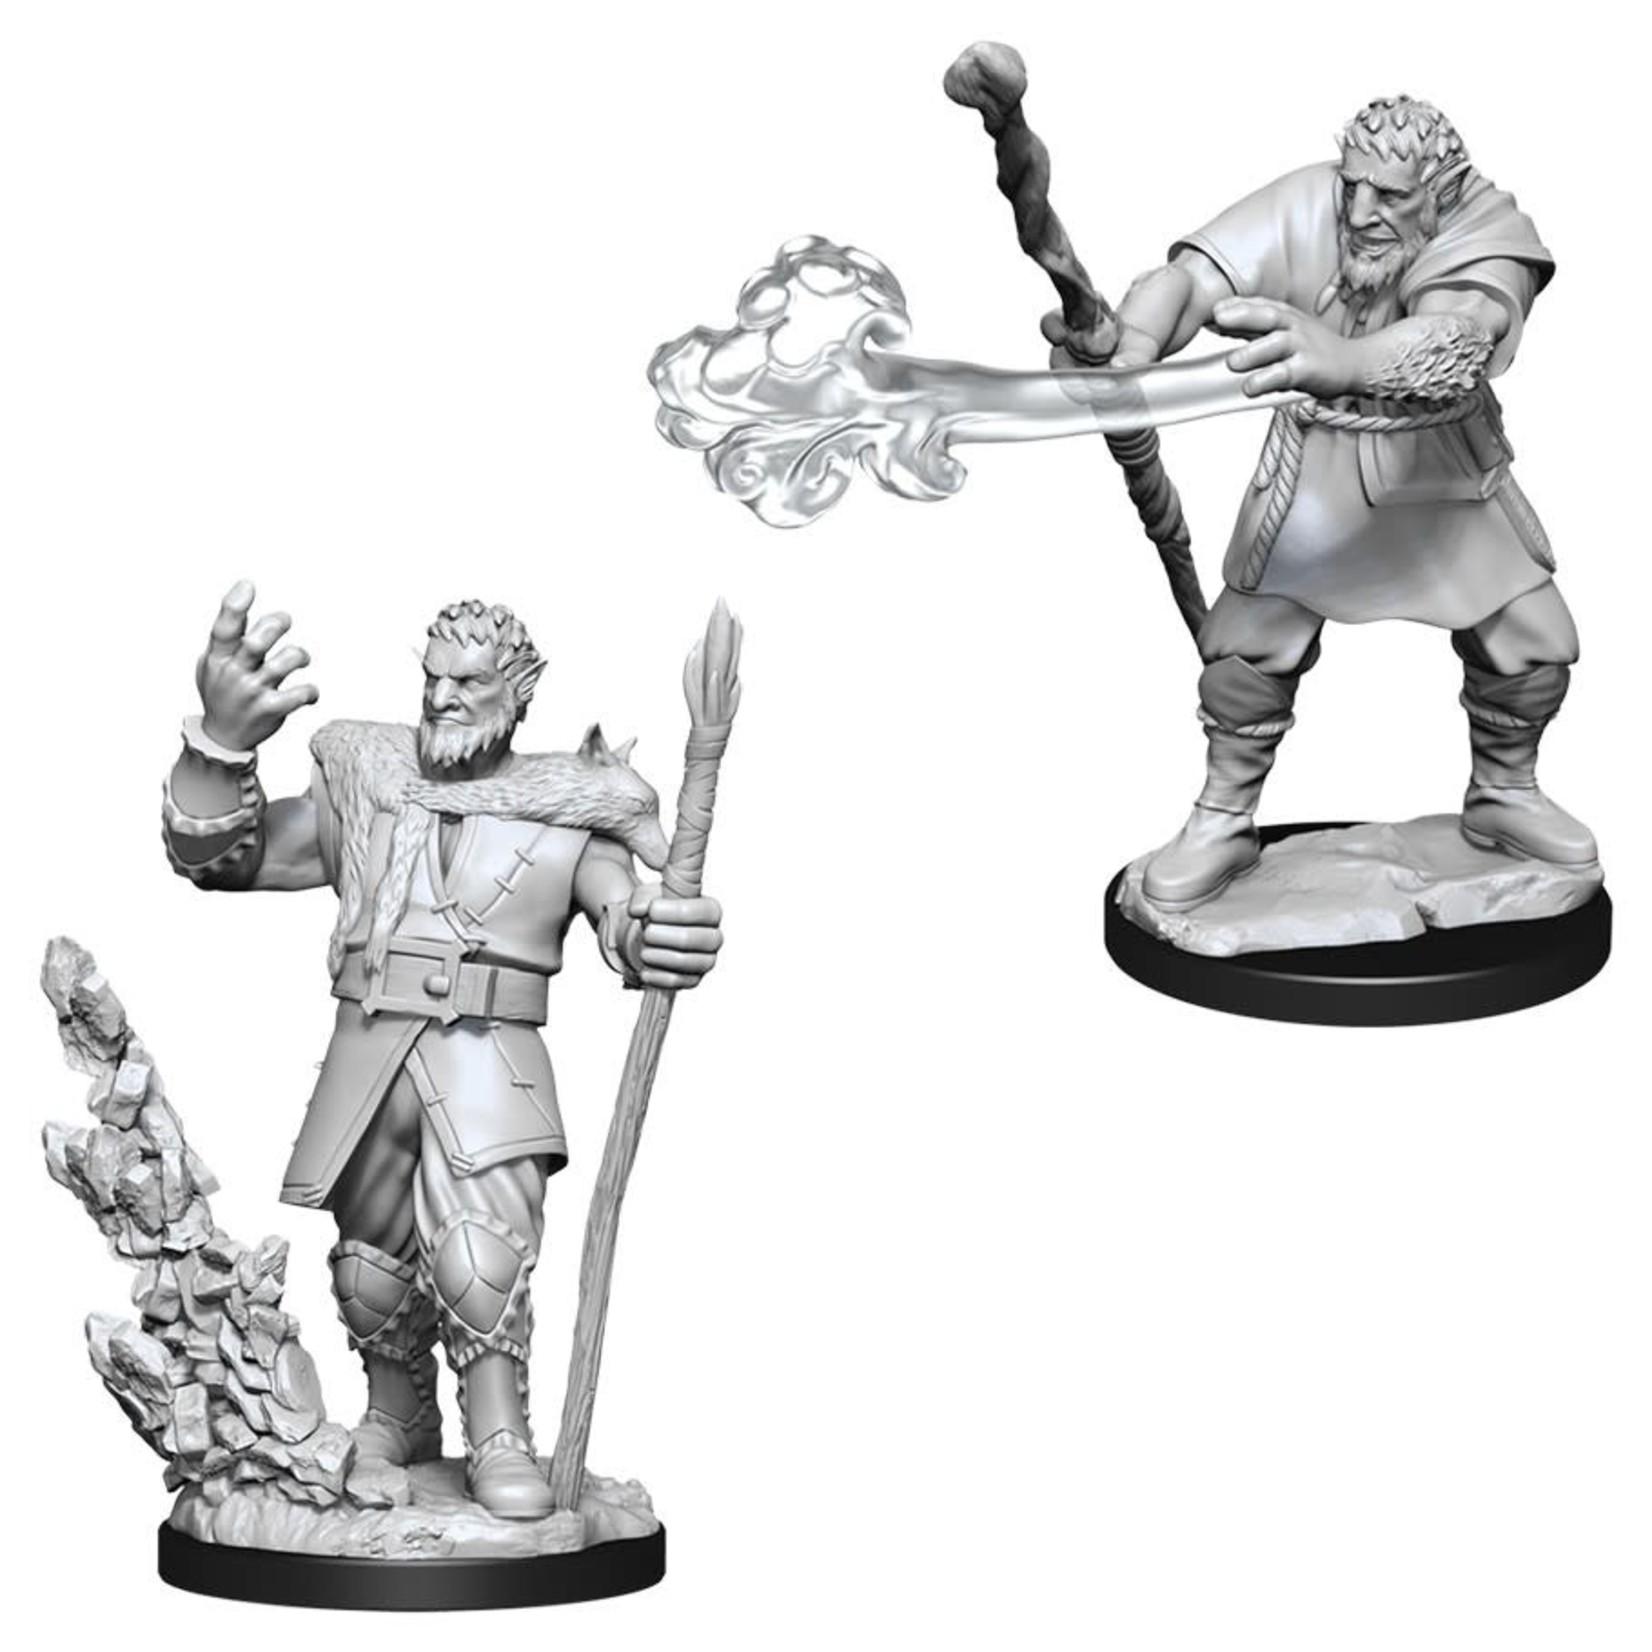 WizKids Dungeons & Dragons Nolzur's Marvelous Miniatures: Male Firbolg Druid